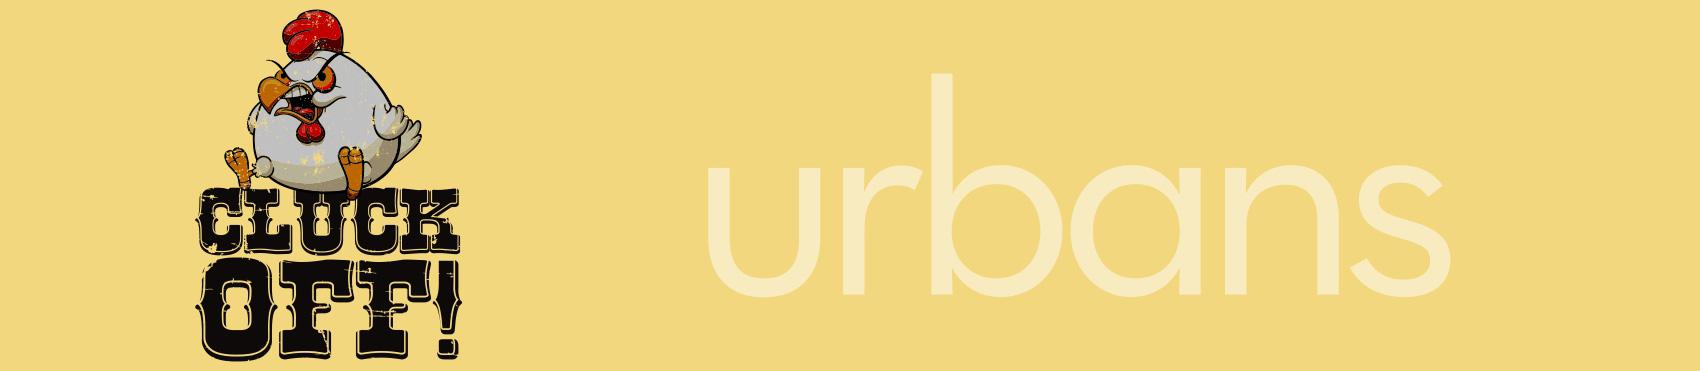 Urbans logo ideas